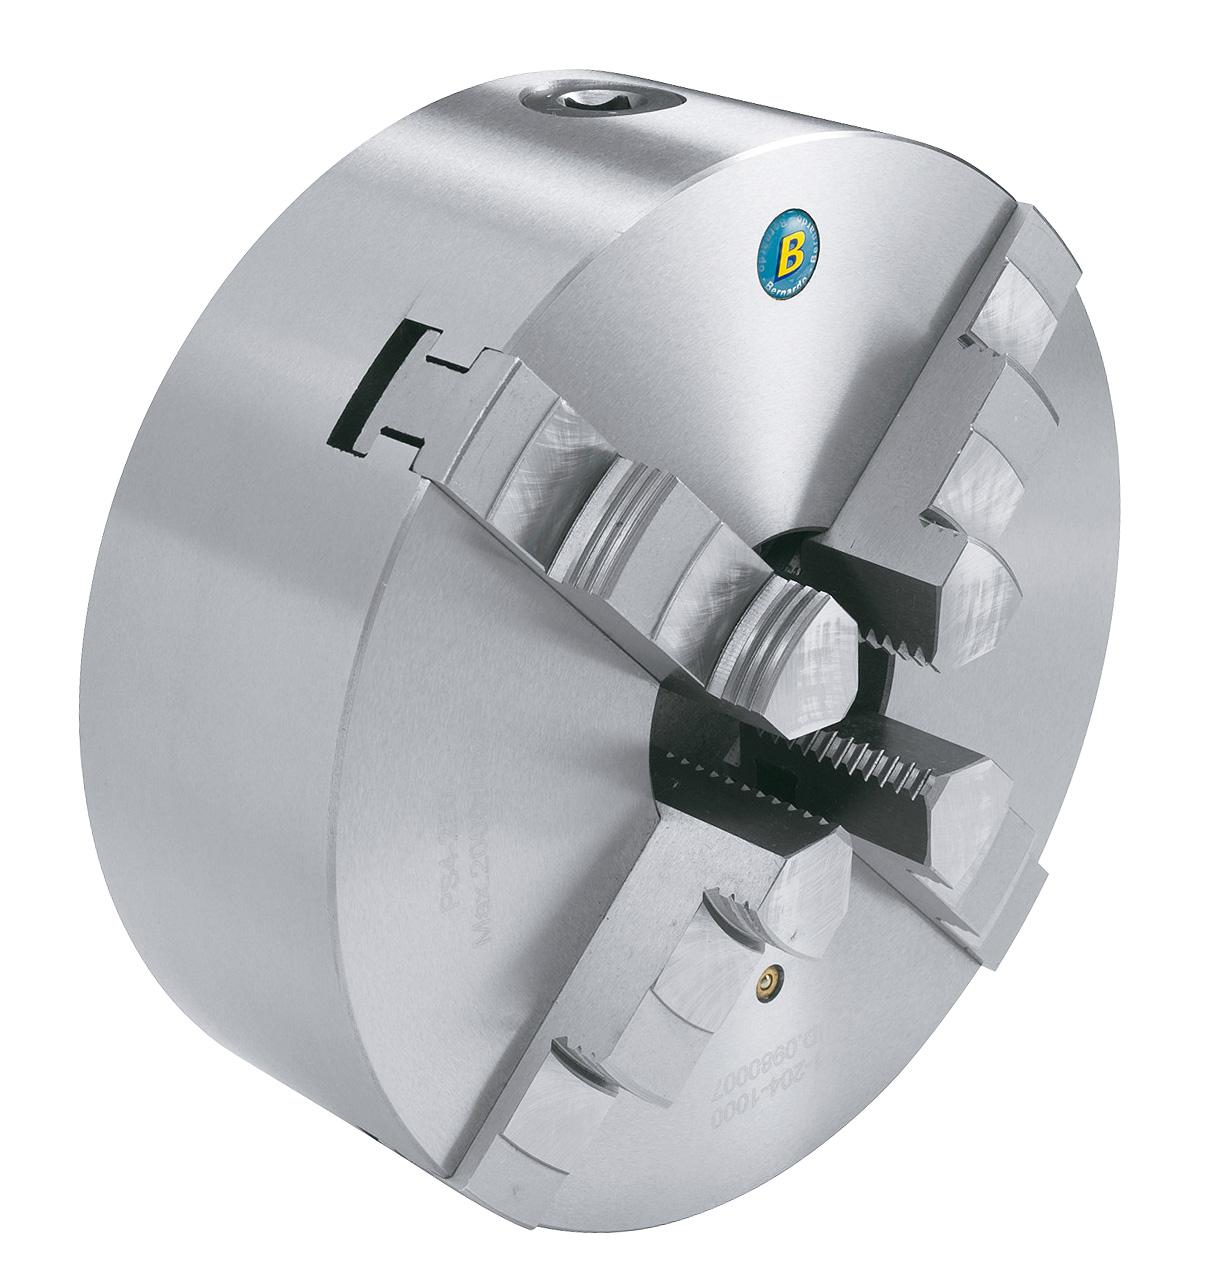 4 bakket centrerpatron standard DK12-200